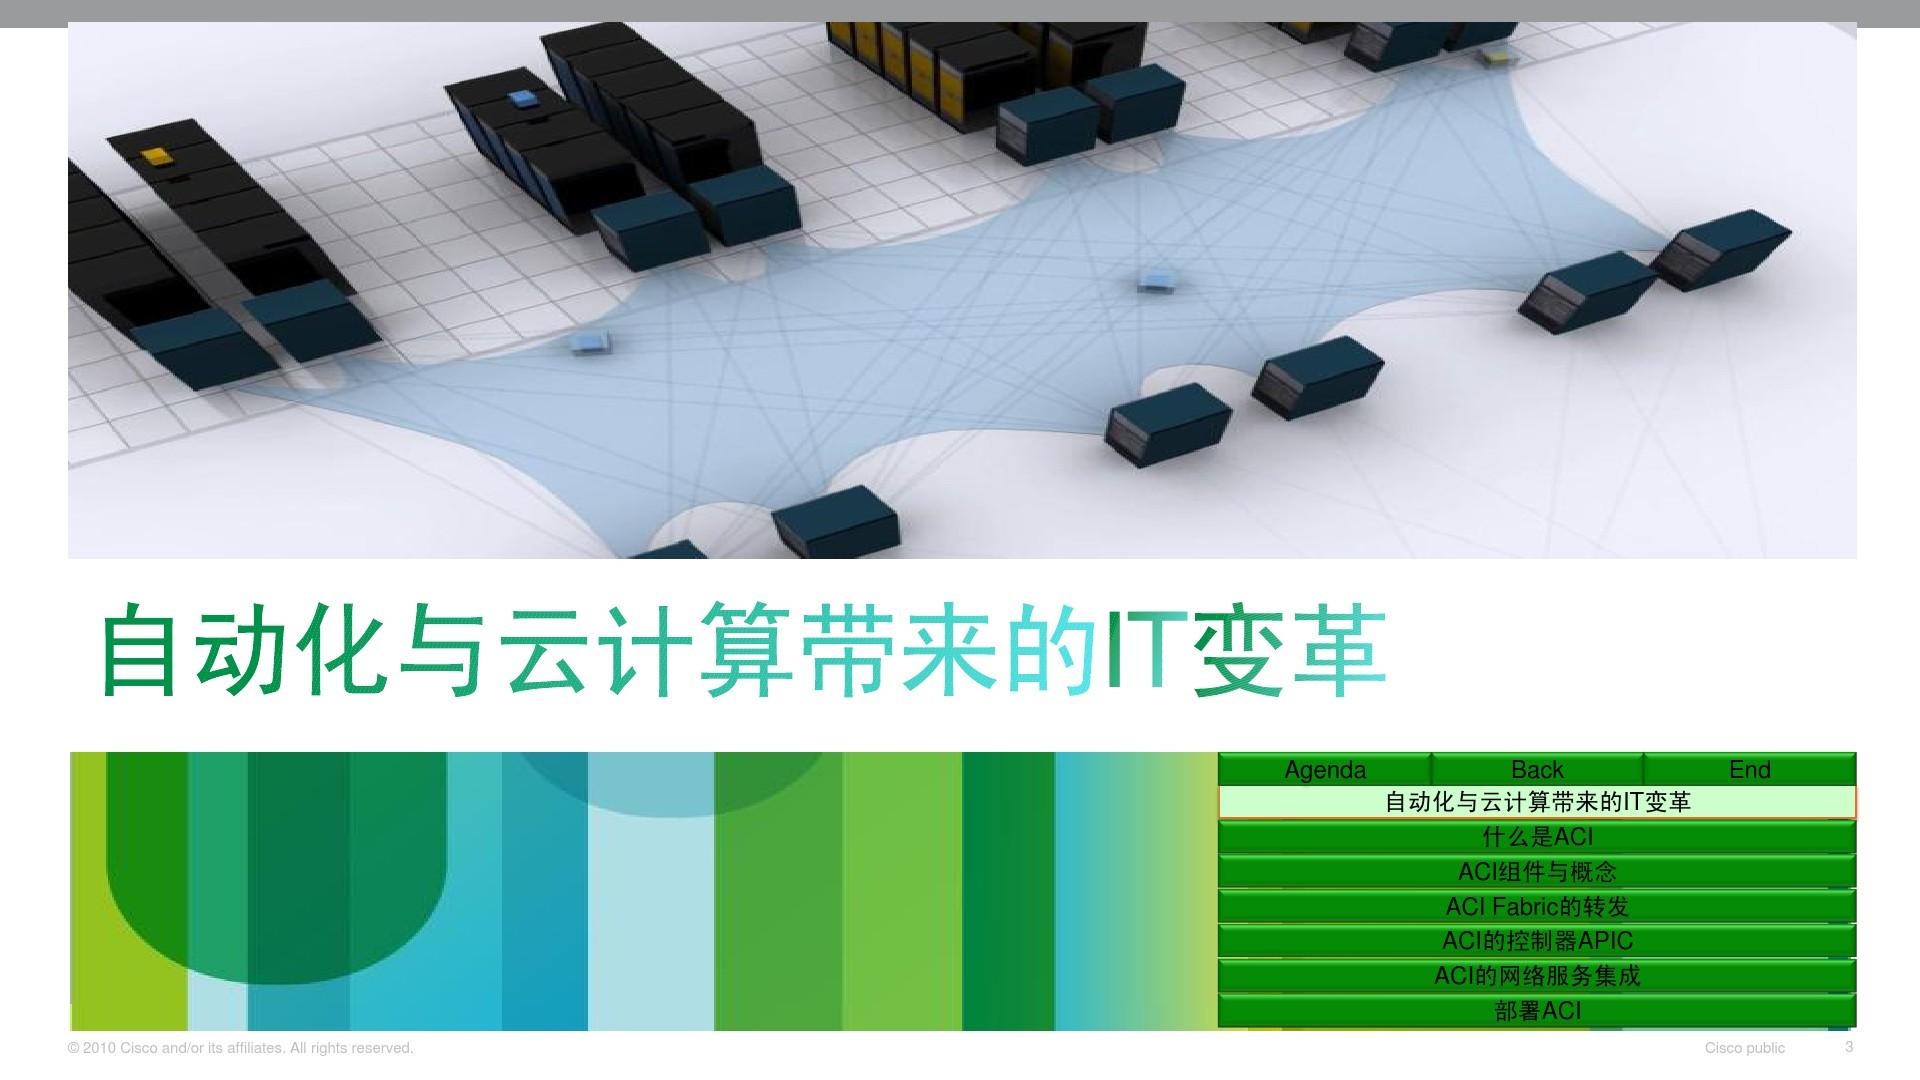 SDN2 0-Cisco ACI简介_图文_百度文库